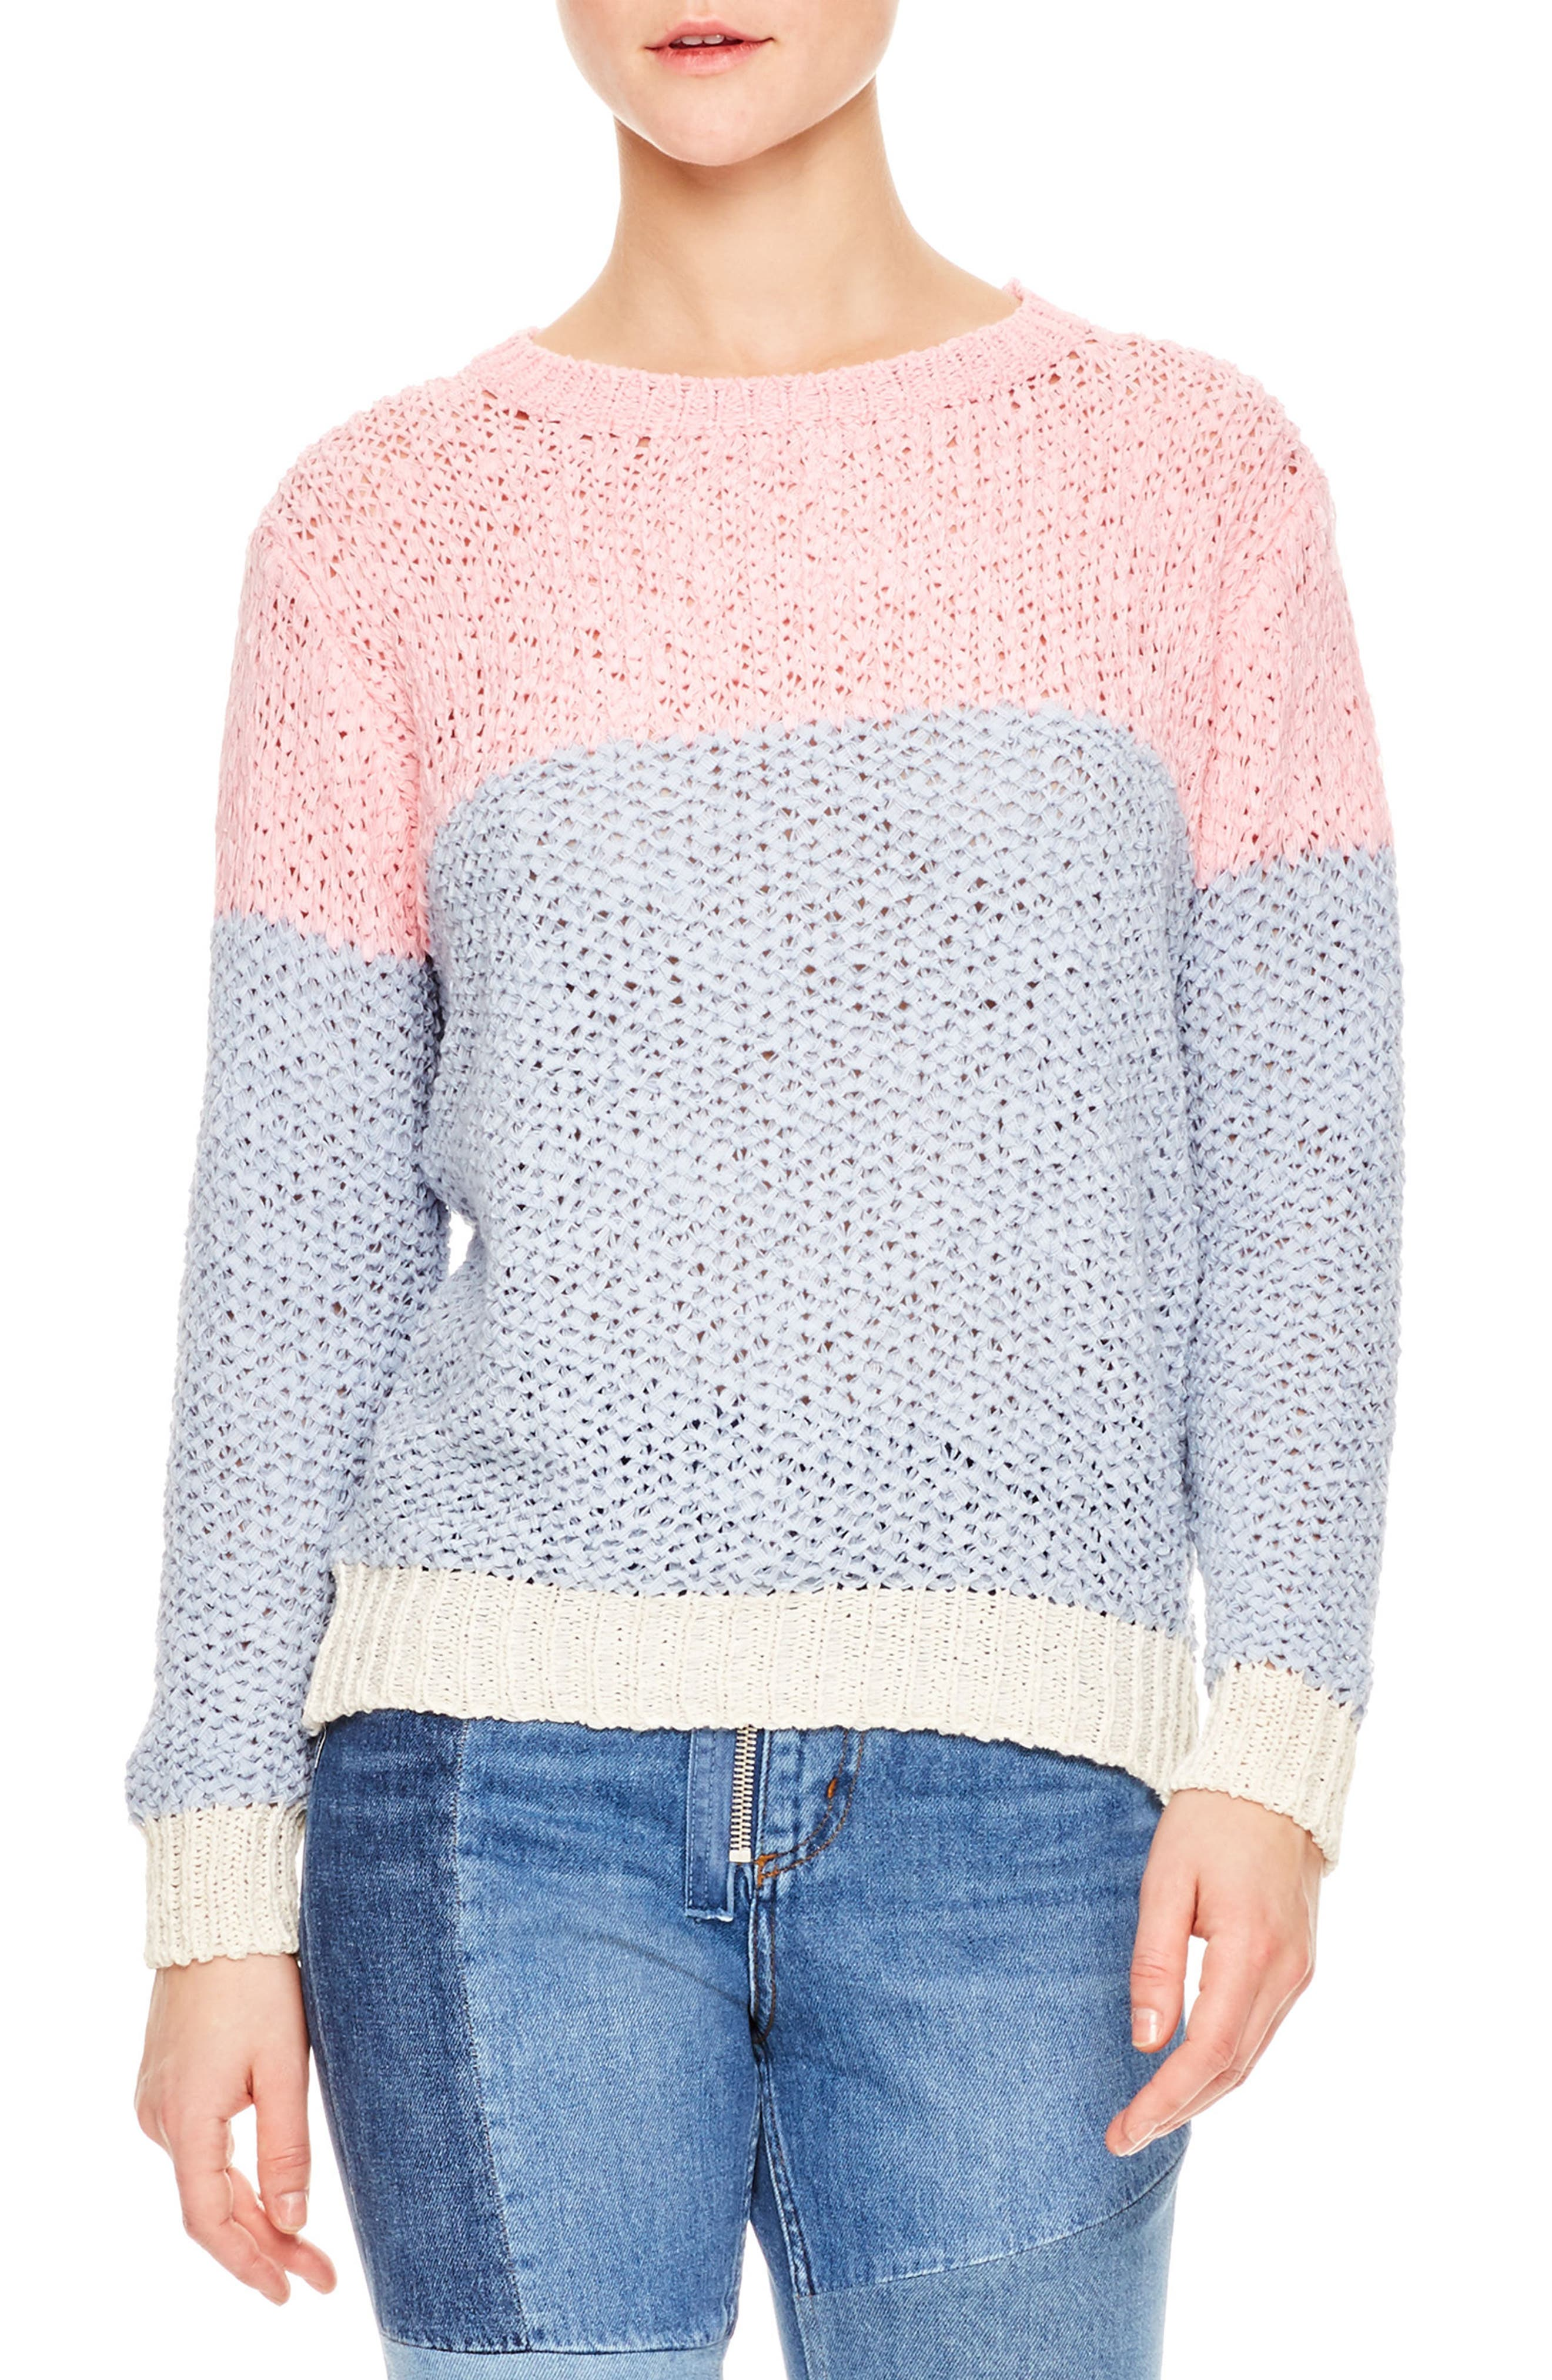 Malabar Colorblock Knit Sweater,                             Main thumbnail 1, color,                             Malabar